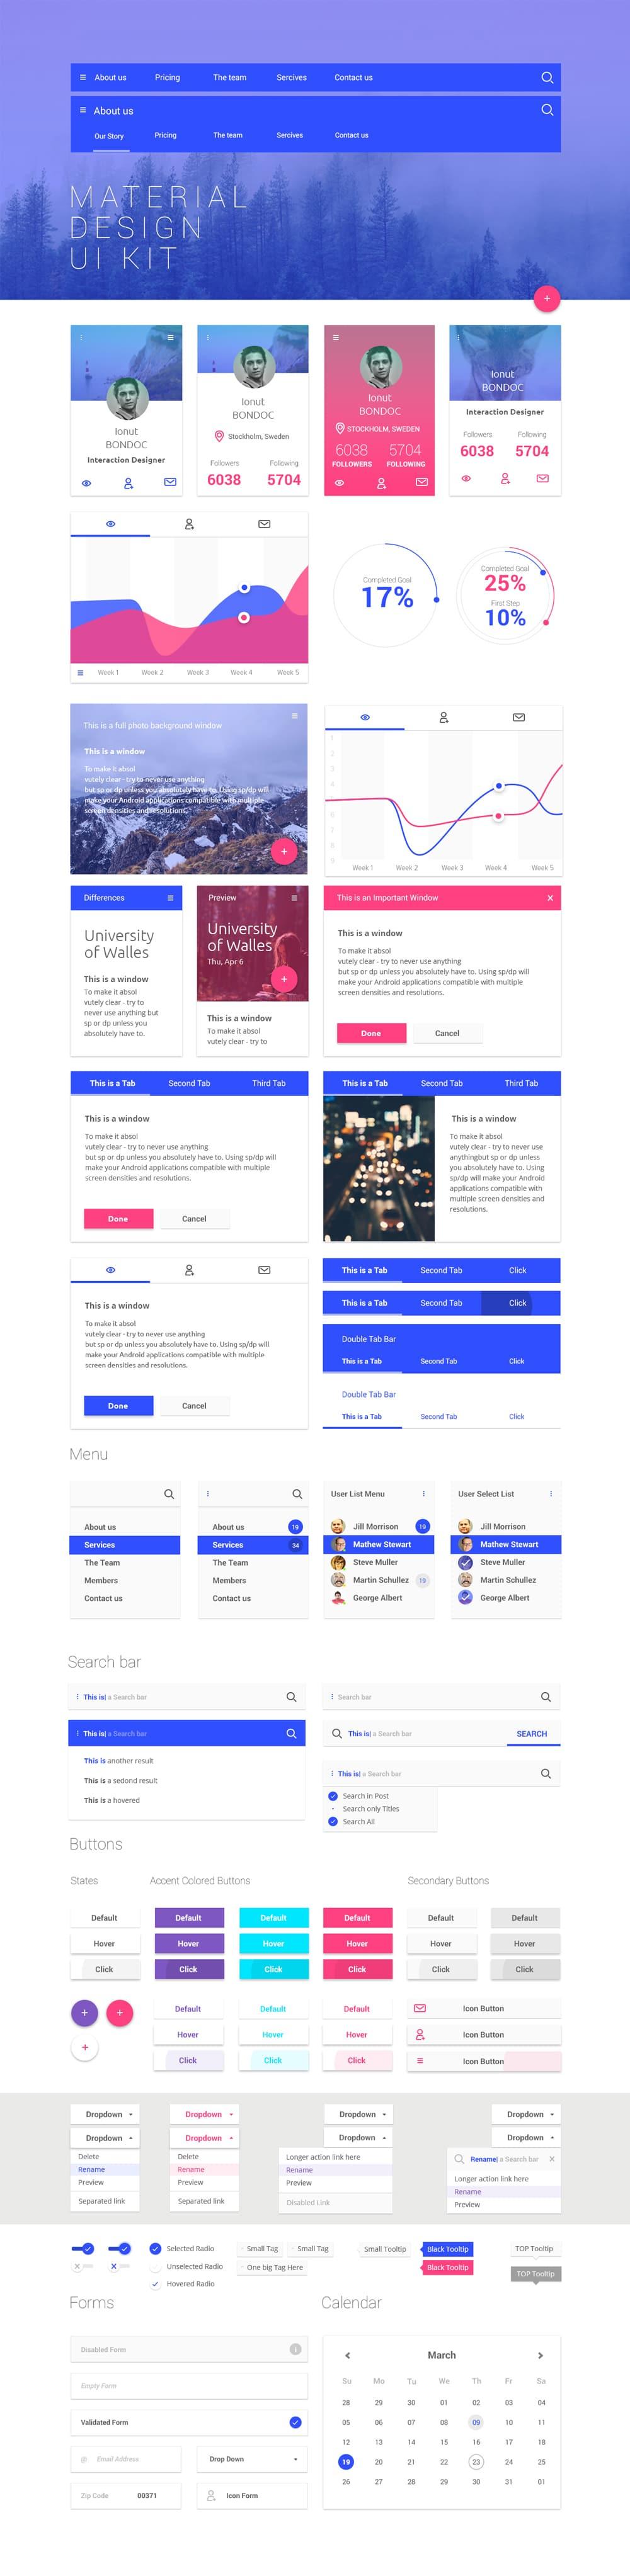 Free Material Design UI Kit PSD